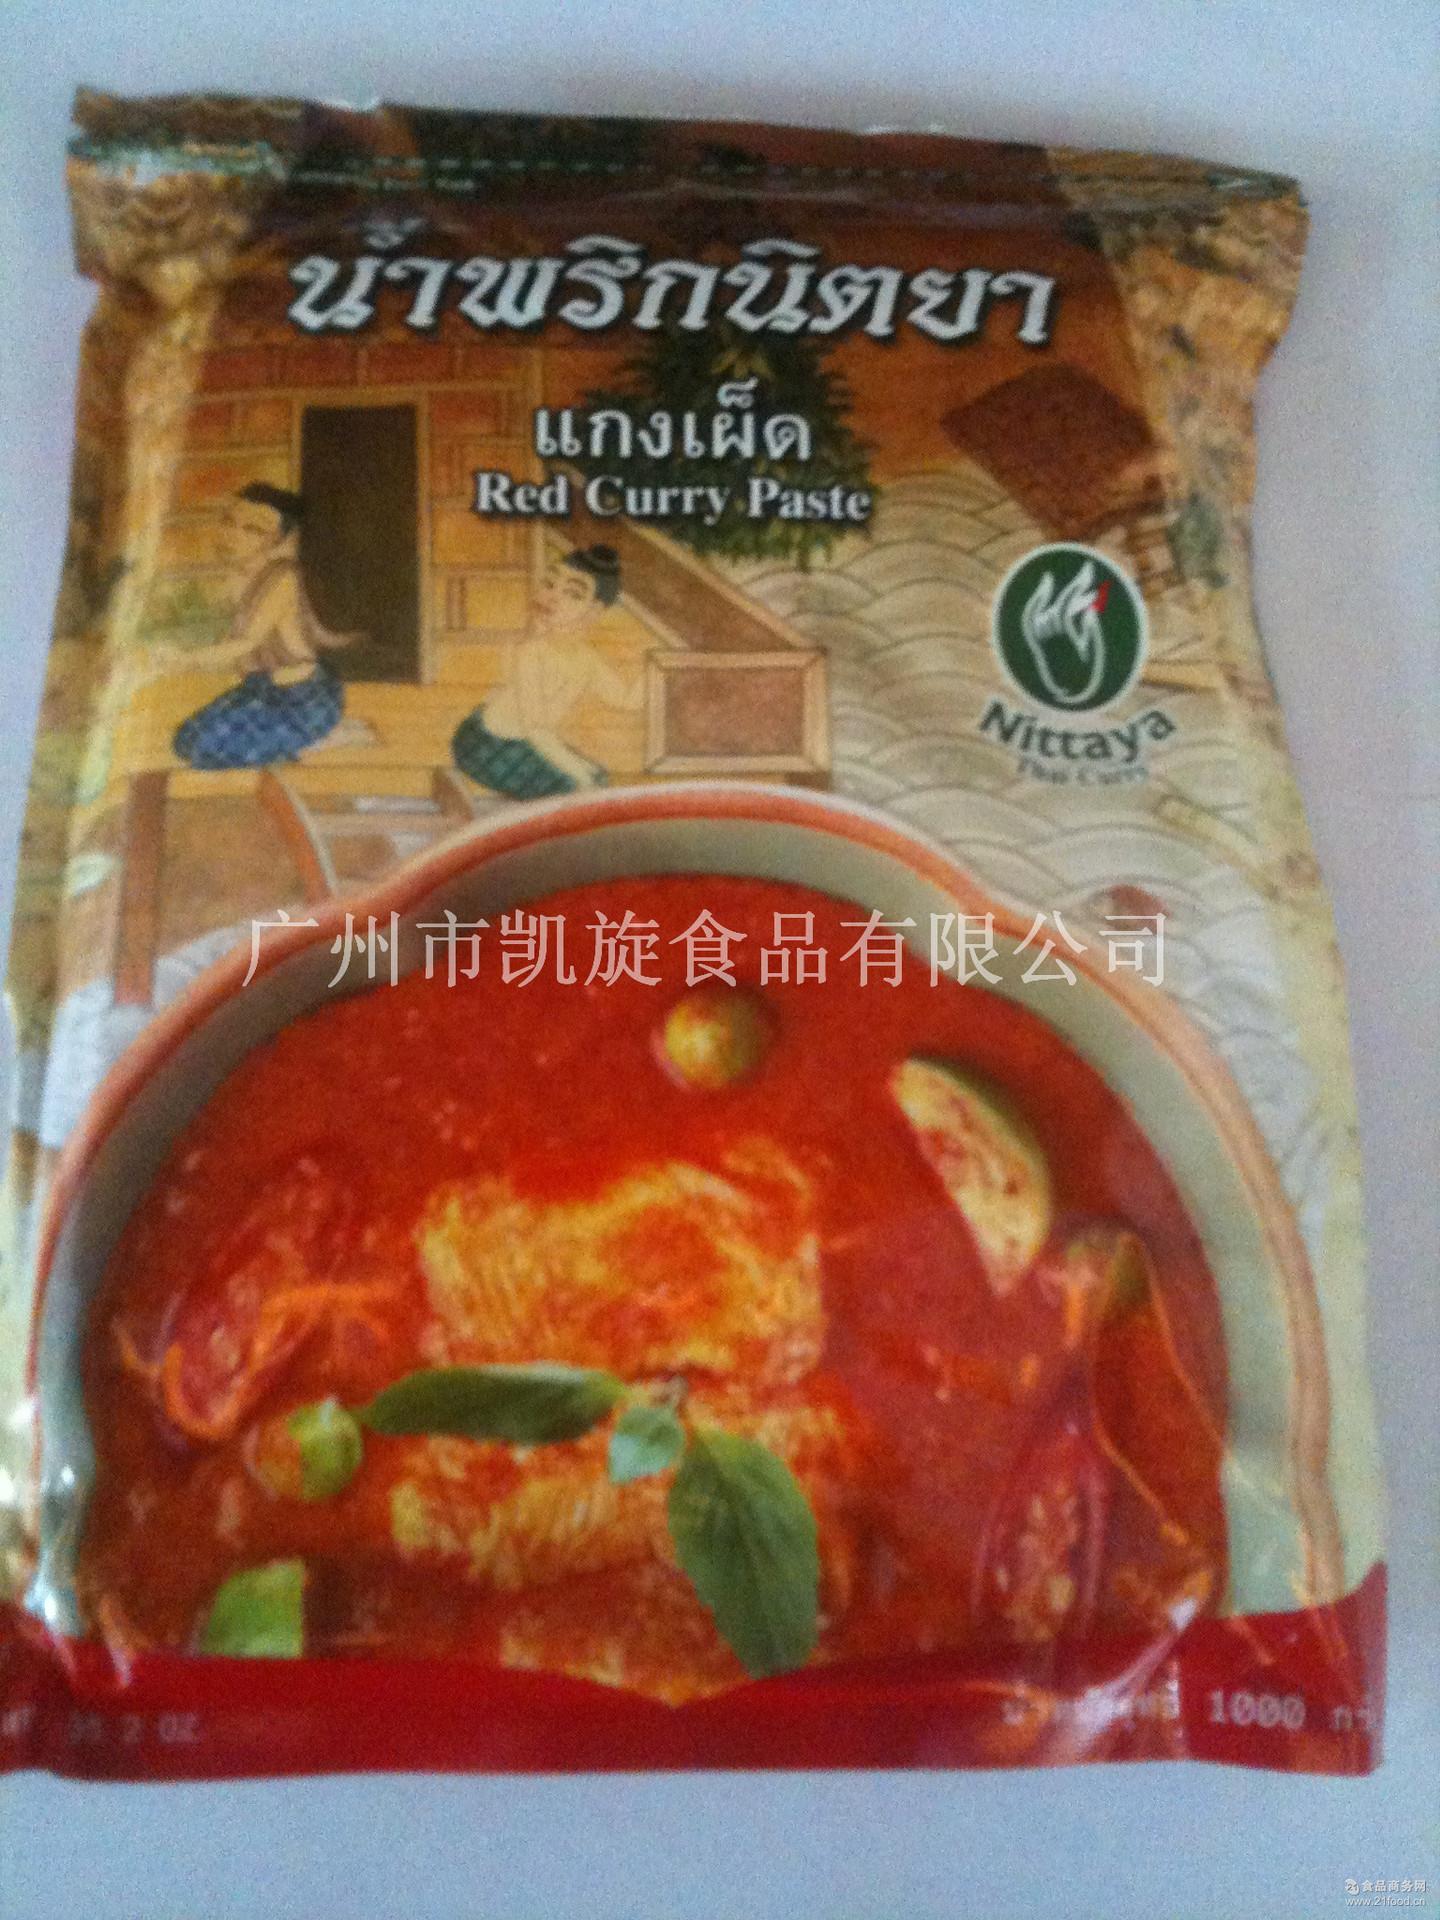 1000g 袋装 泰国进口 整箱批发价格更优惠 NITTAYA立他椰红咖喱